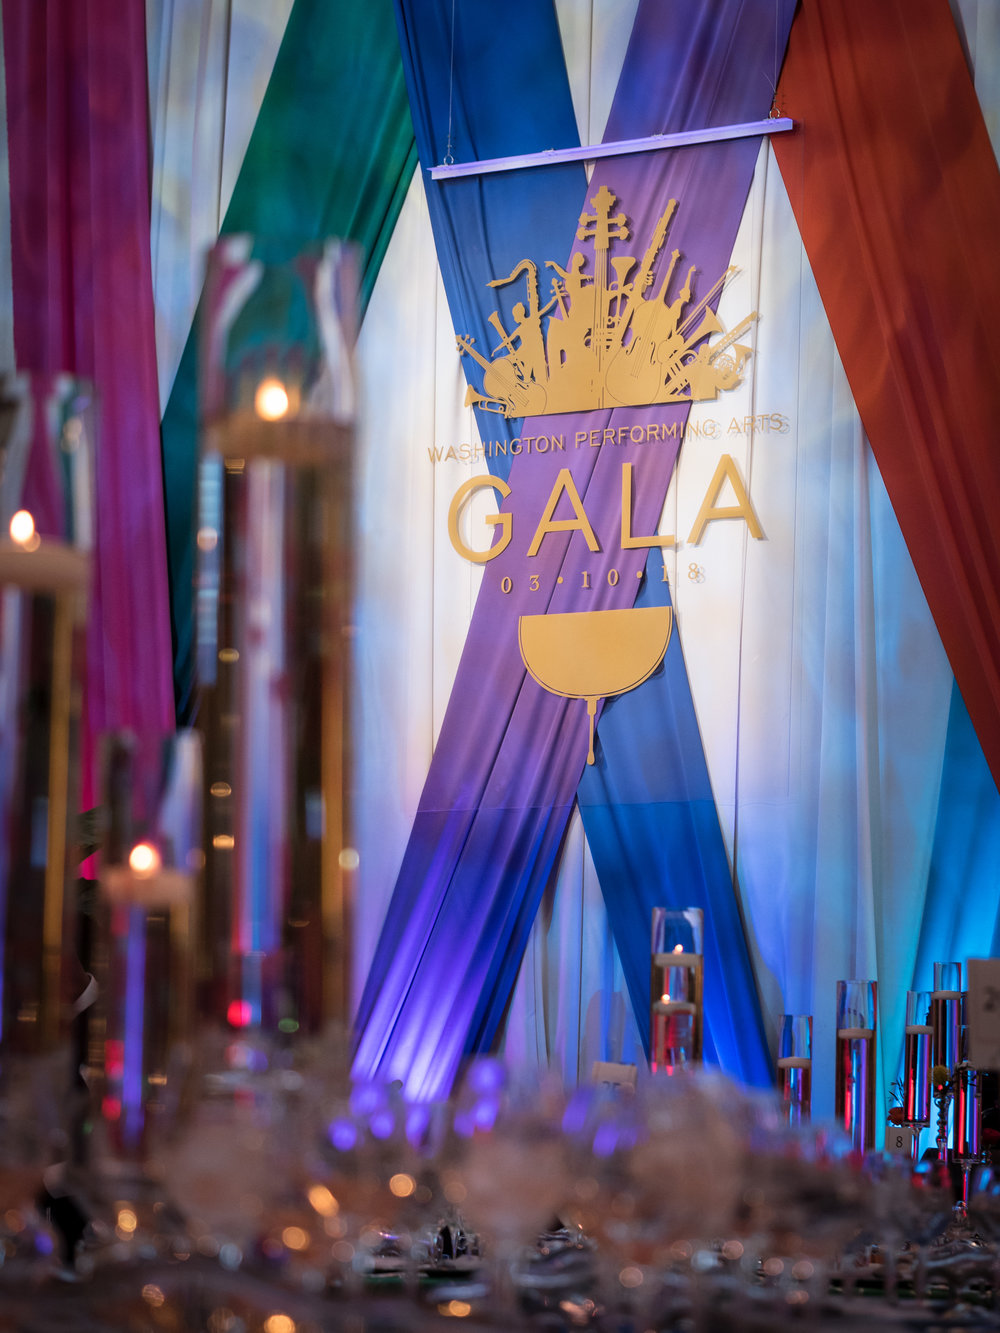 Washington Performing Arts Gala 2018 -